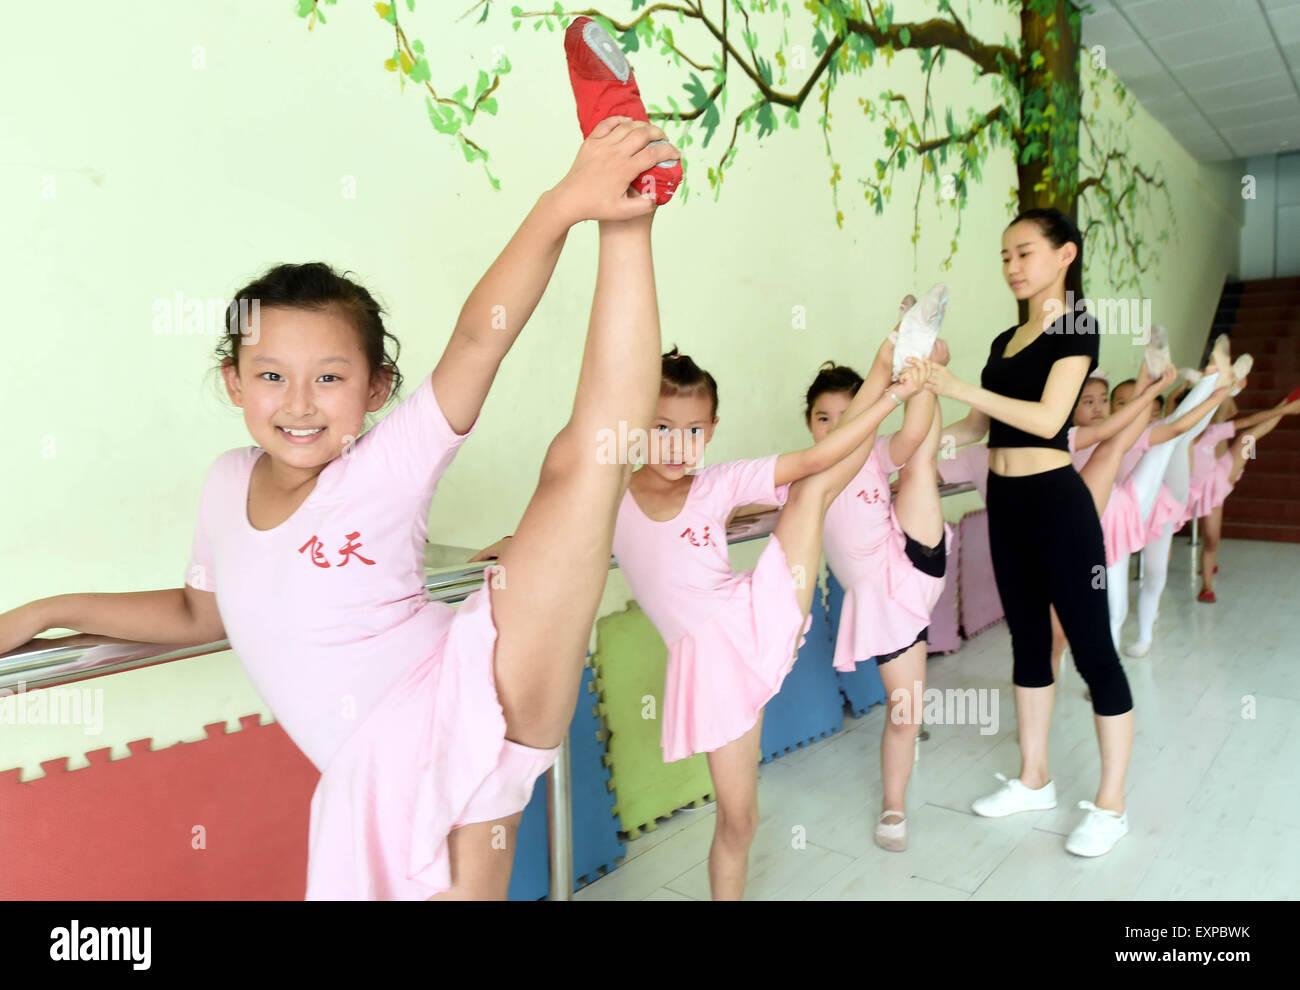 (150716) -- BAZHOU, July 16, 2015 (Xinhua) -- Children learn to dance at an interest class in Shengfang Township - Stock Image